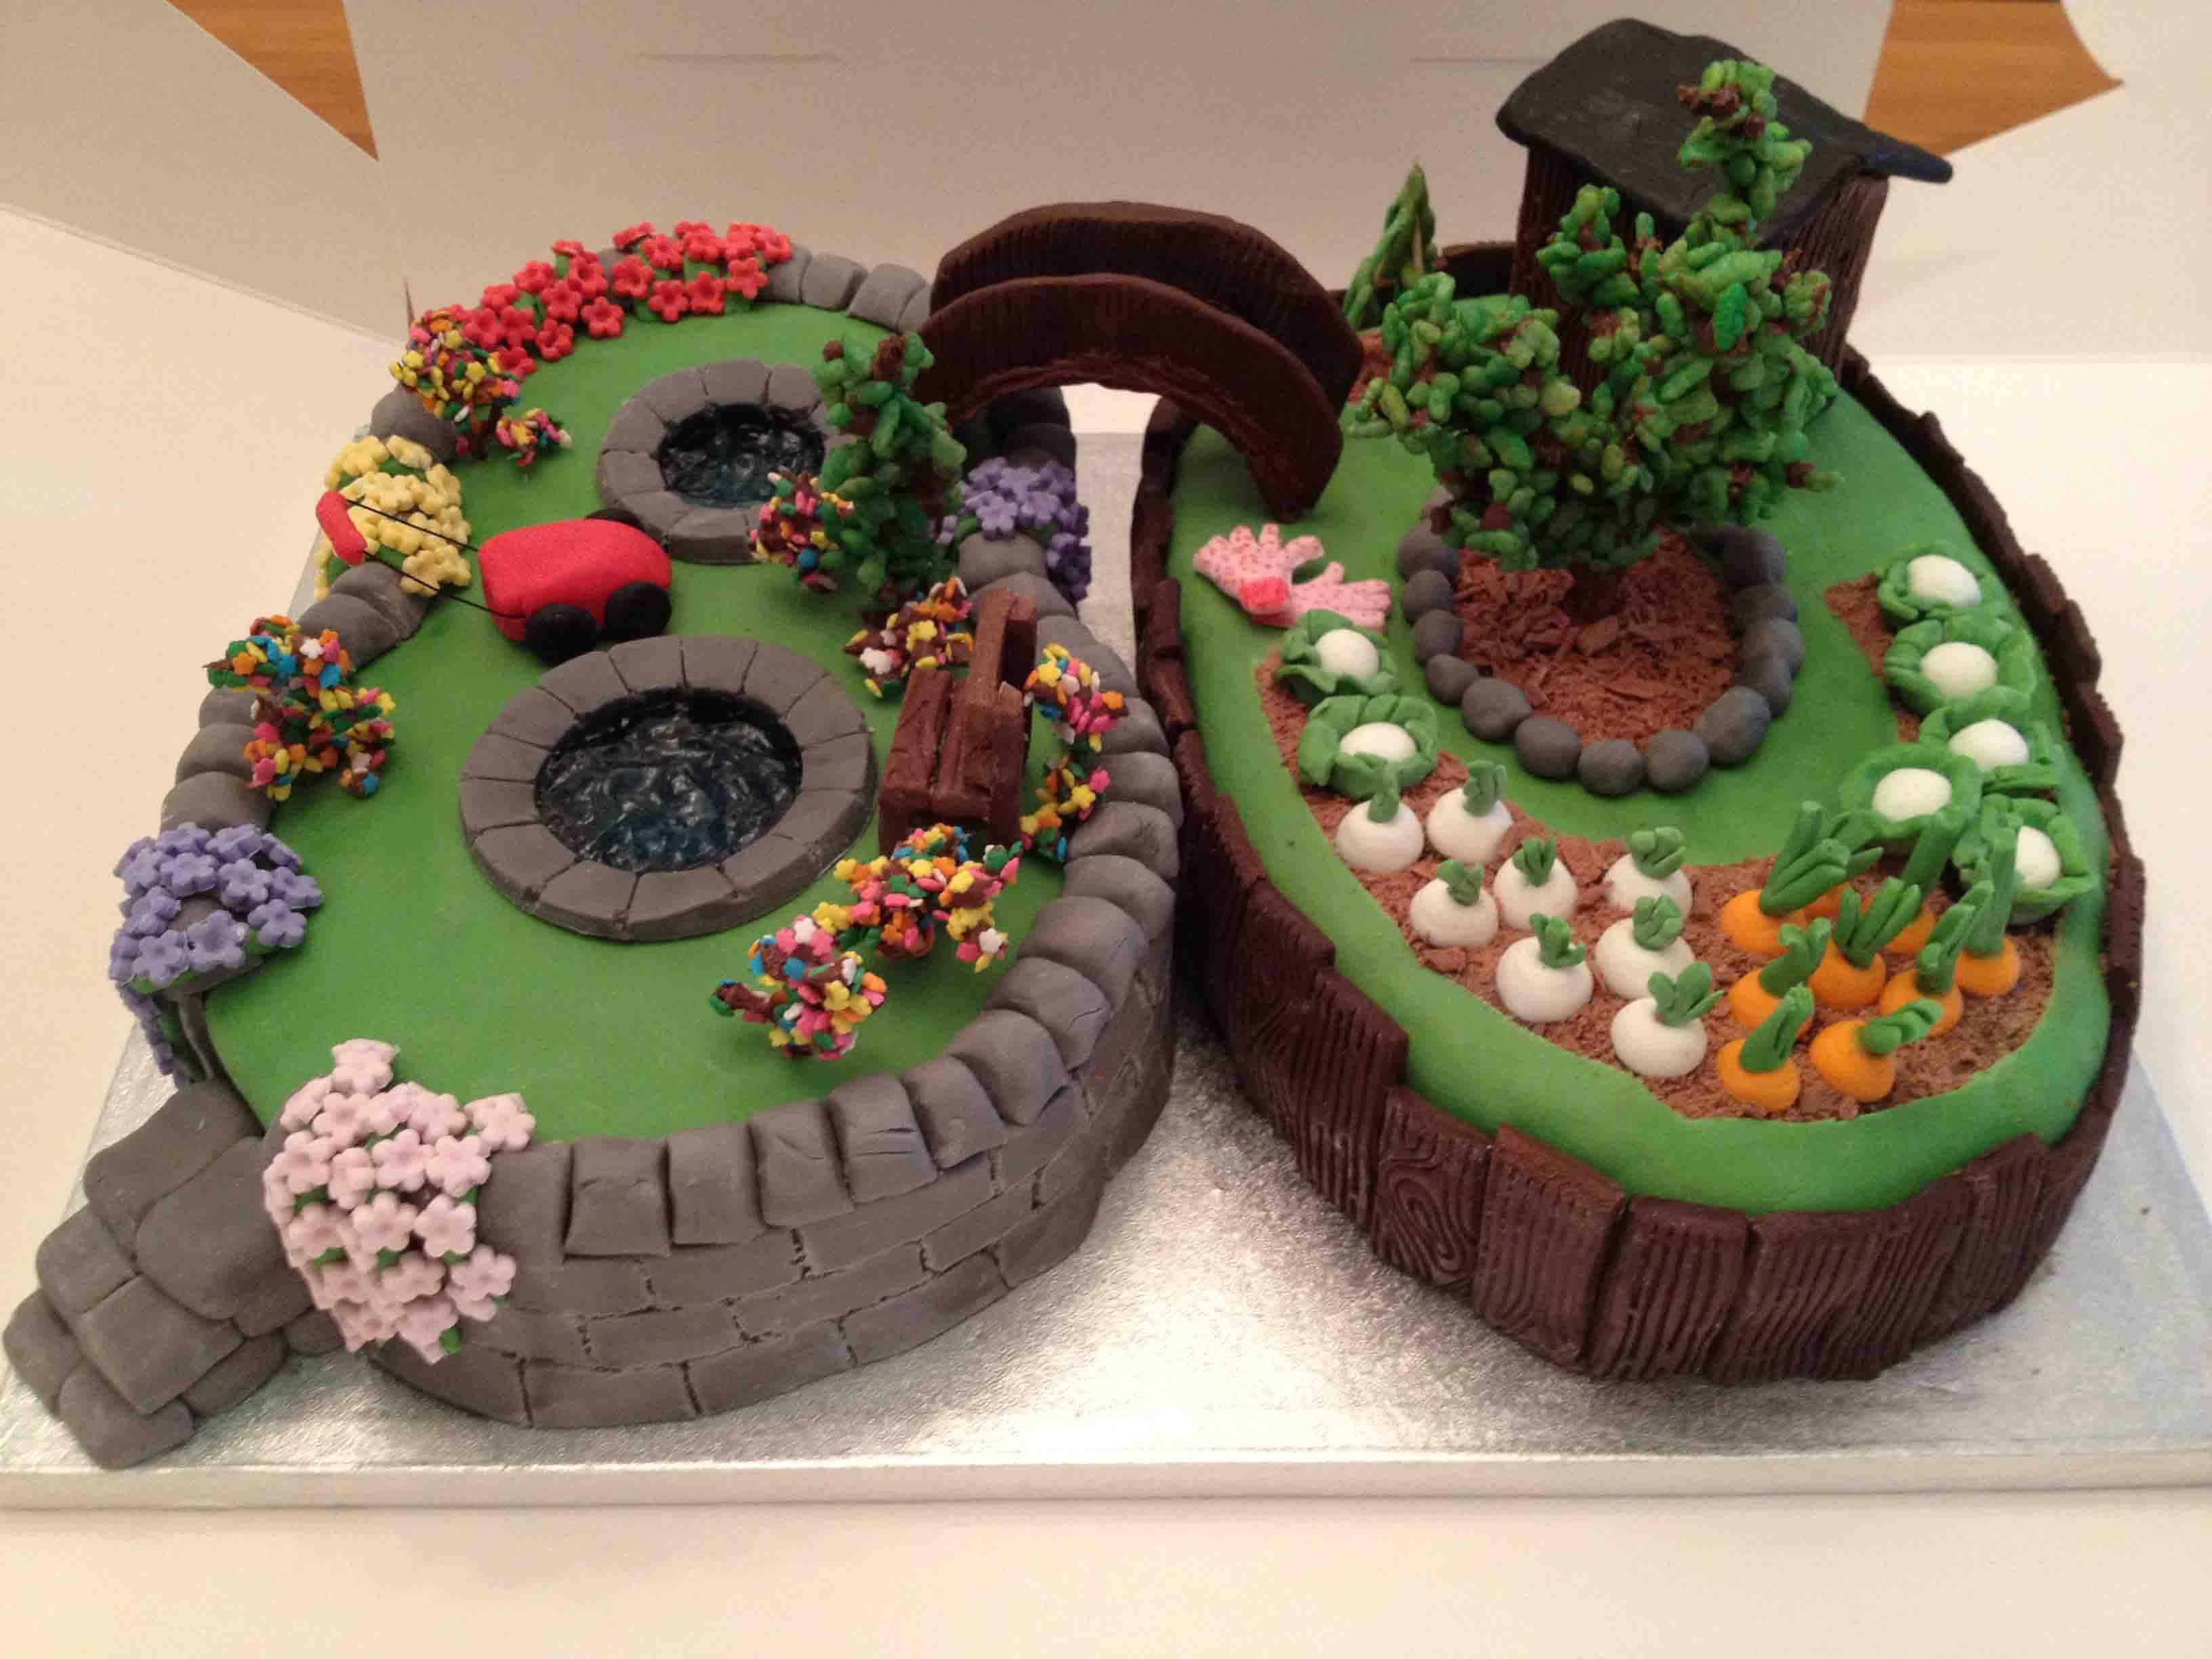 garden cakes - Google Search | Gardening Cakes | Pinterest ...